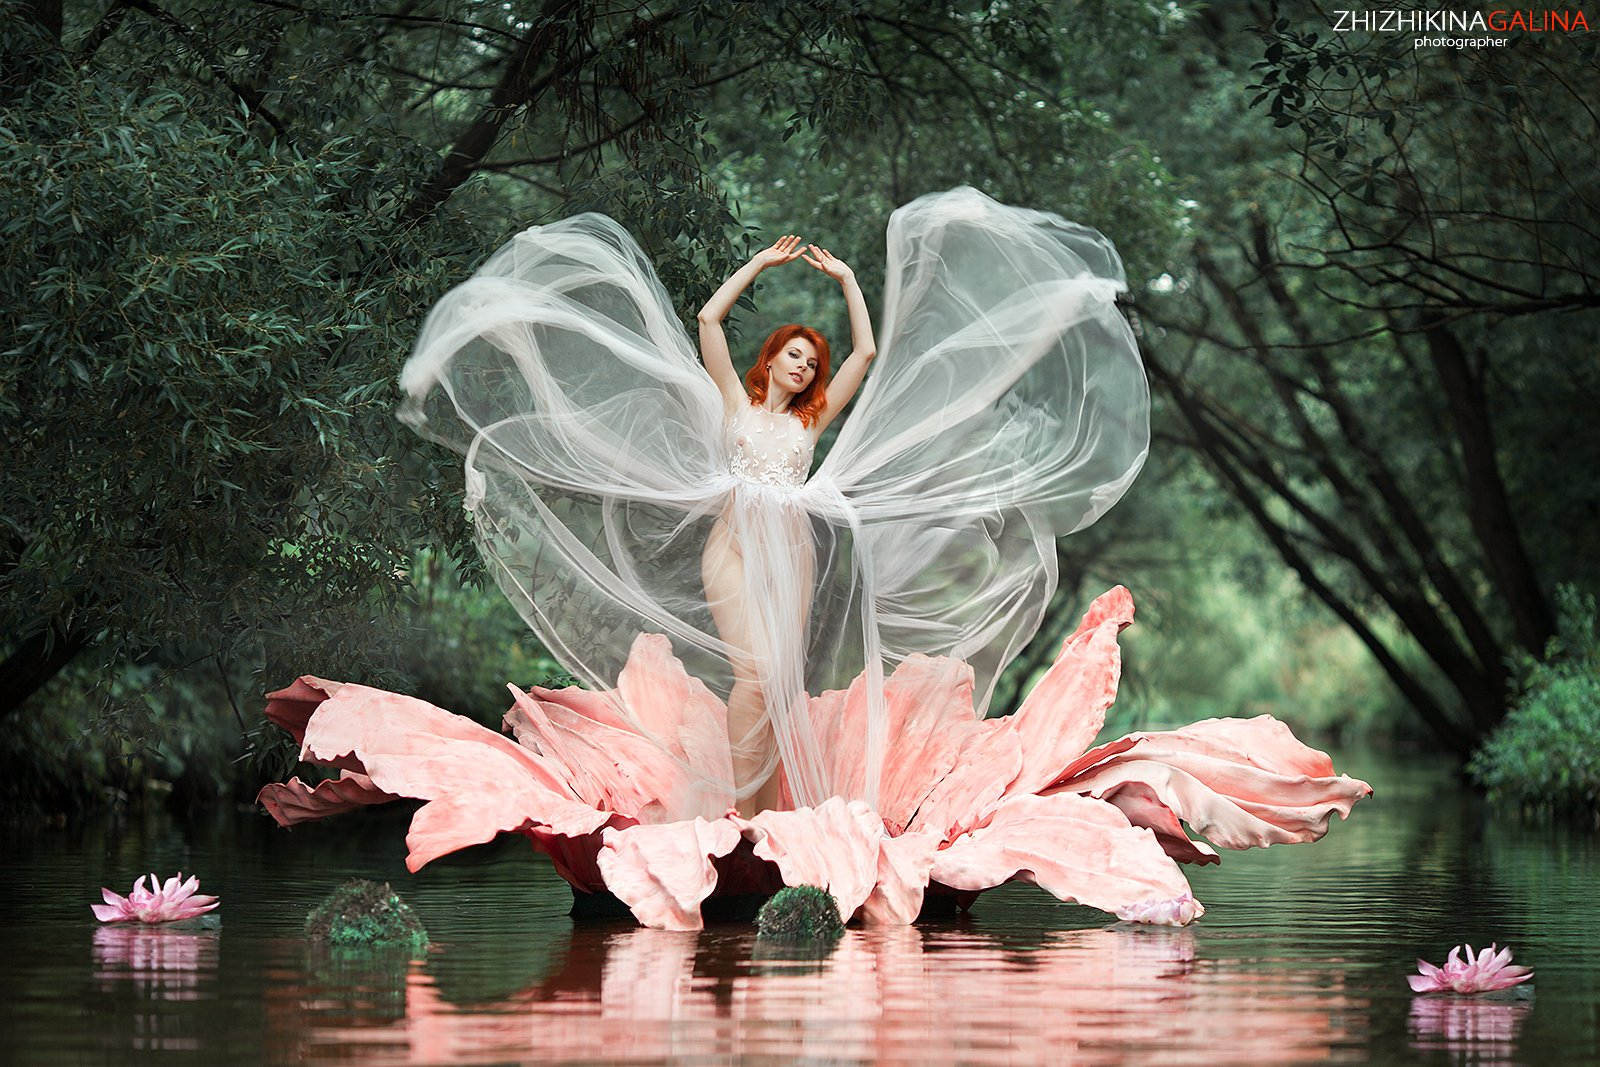 девушка, цветок, портрет, бабочка, ню, артню, природа, река, вода, кувшинка, nude, portrait, nu, girl, photo,, Галина Жижикина